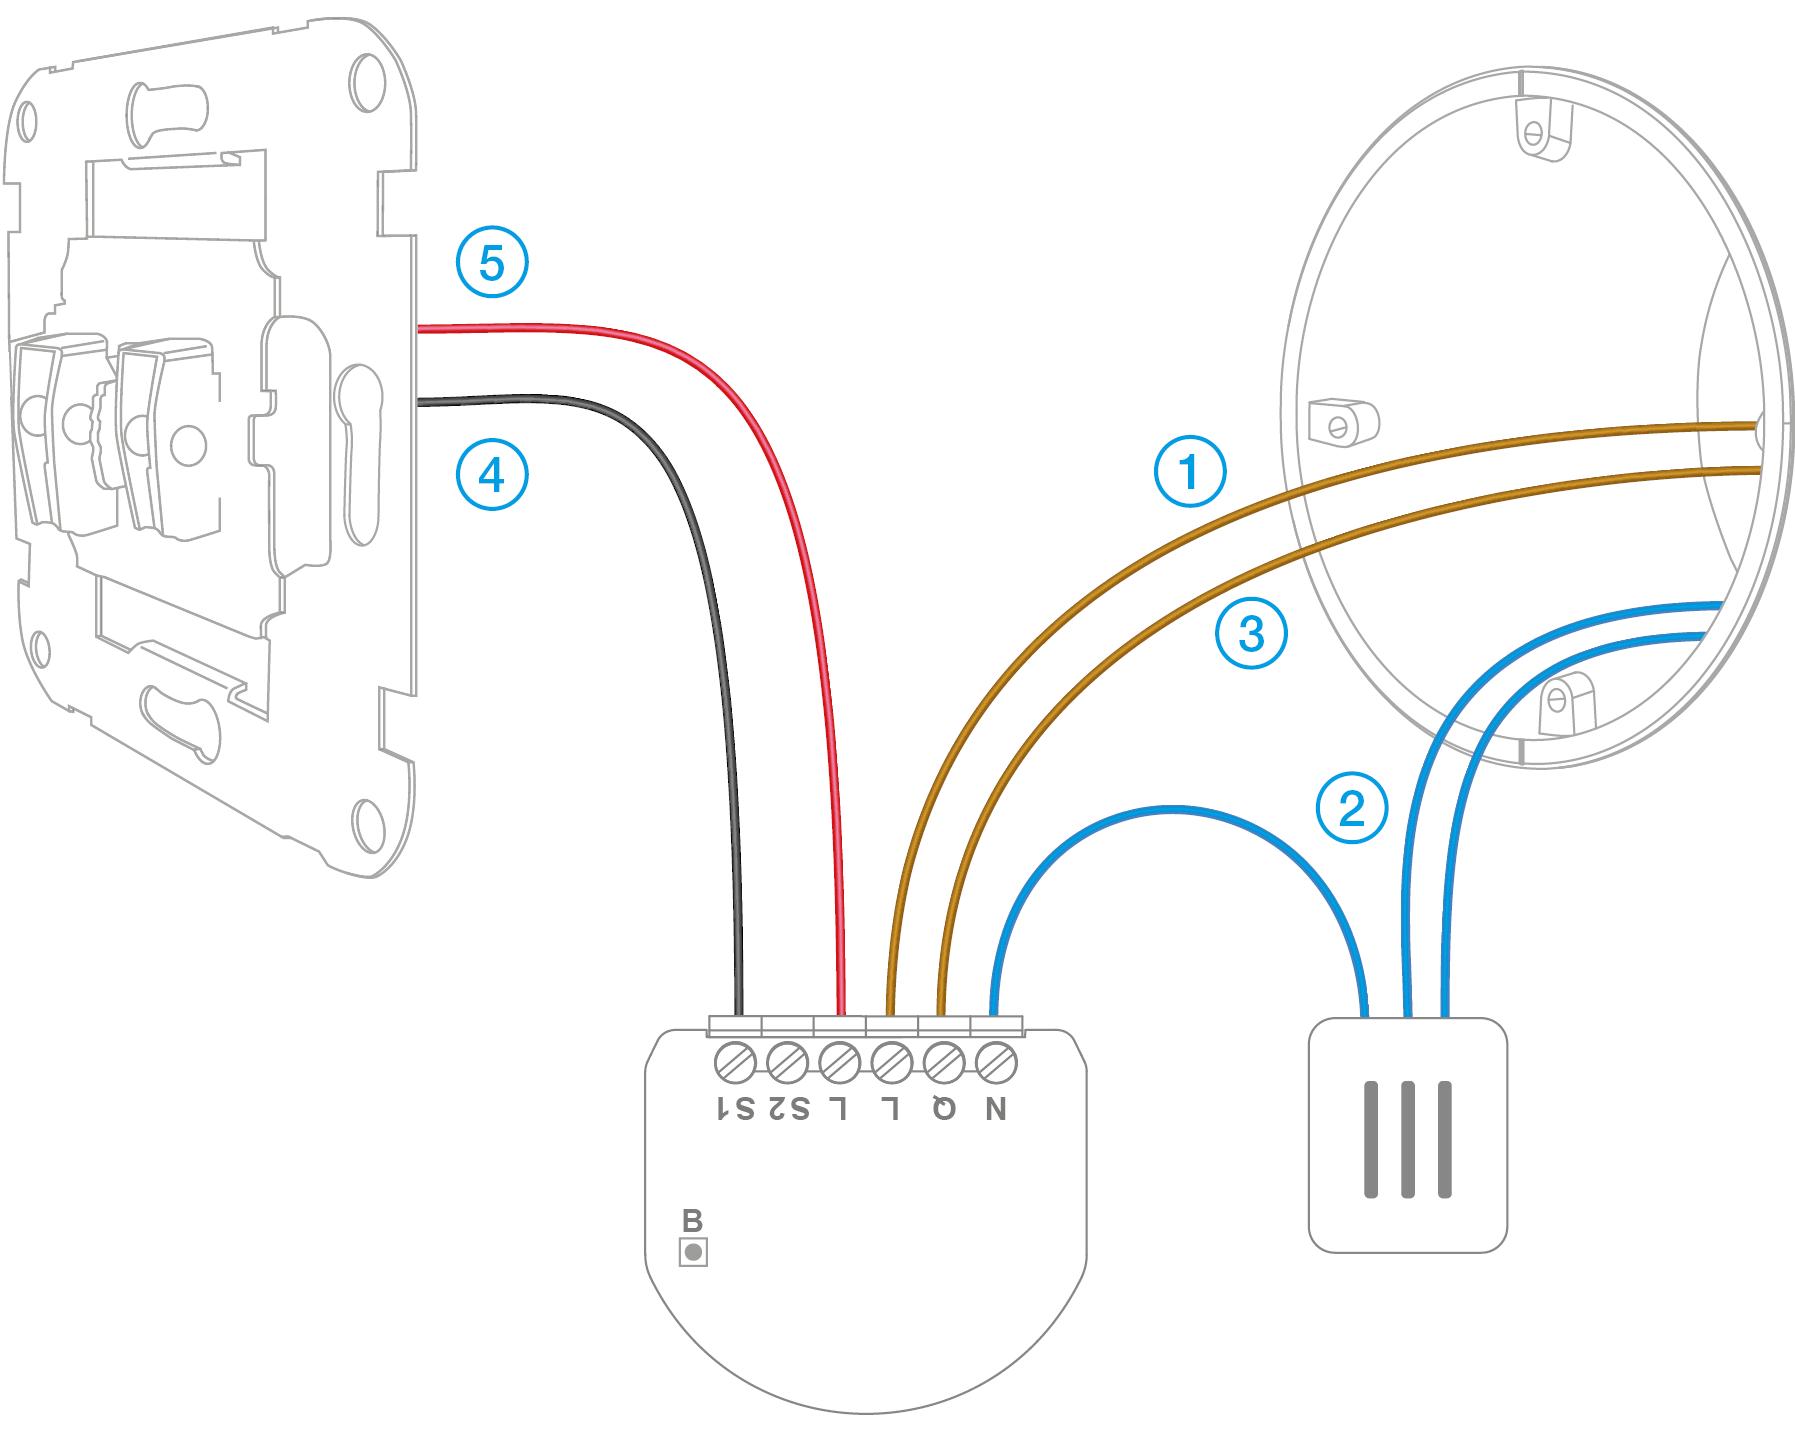 Single Switch Wiring Diagram Just Another Blog Pole Light Fibaro And Neutral Lacking Installation Mysmarthomekit Rh Eu Double Throw Rocker